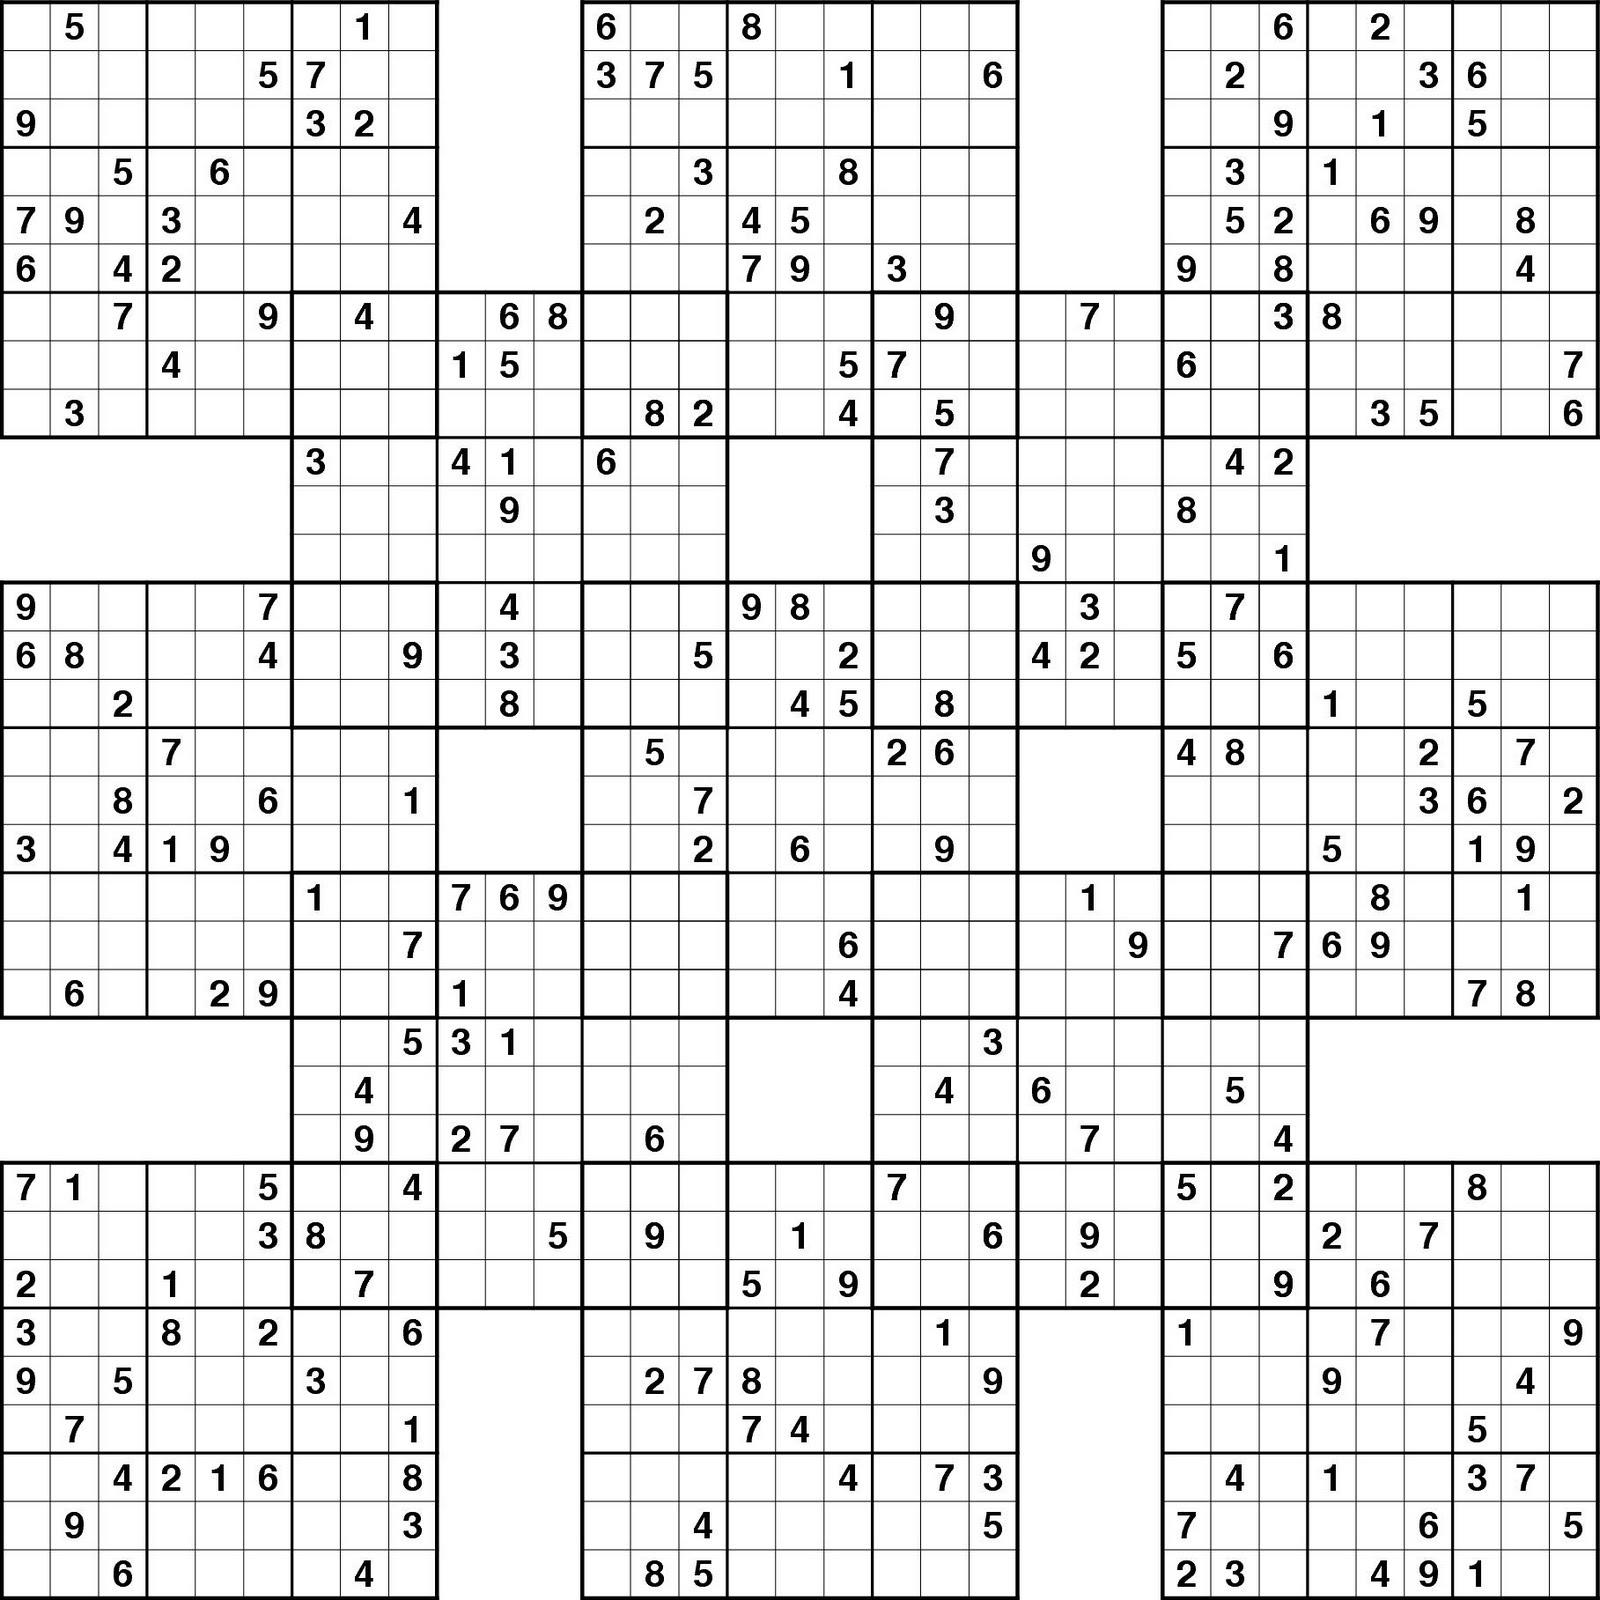 26 Free Printable Sudoku Puzzles 16X16, 16X16 Free Printable